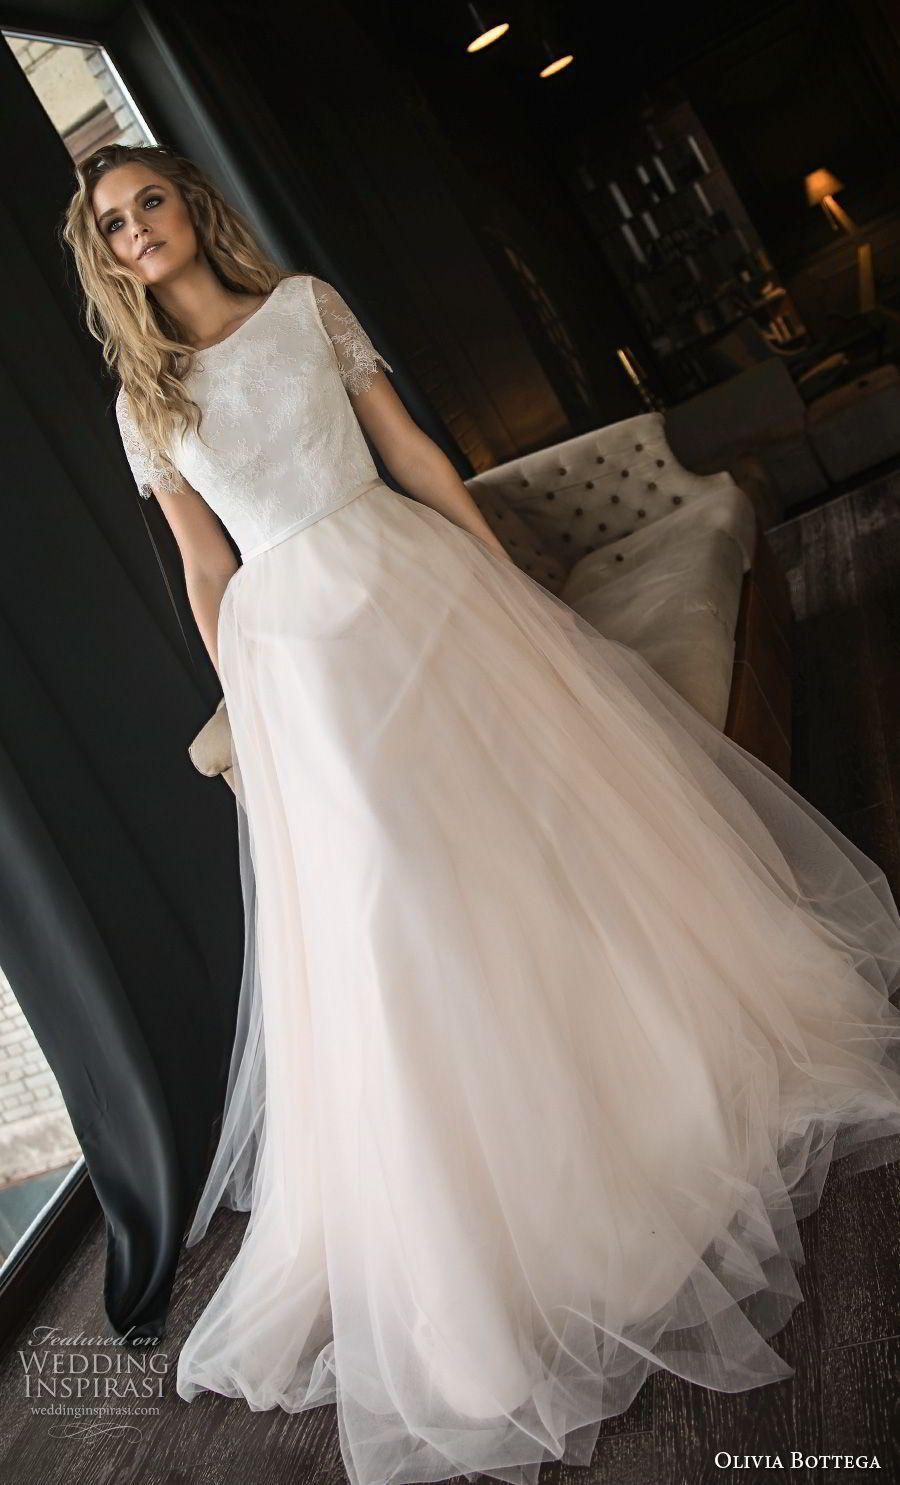 Olivia Bottega 2018 Bridal Short Sleeves Bateau Neckline Lightly Embellished Bodice Tulle Skirt Rom Short Bridal Dress Wedding Gown A Line Long Wedding Dresses [ 1485 x 900 Pixel ]